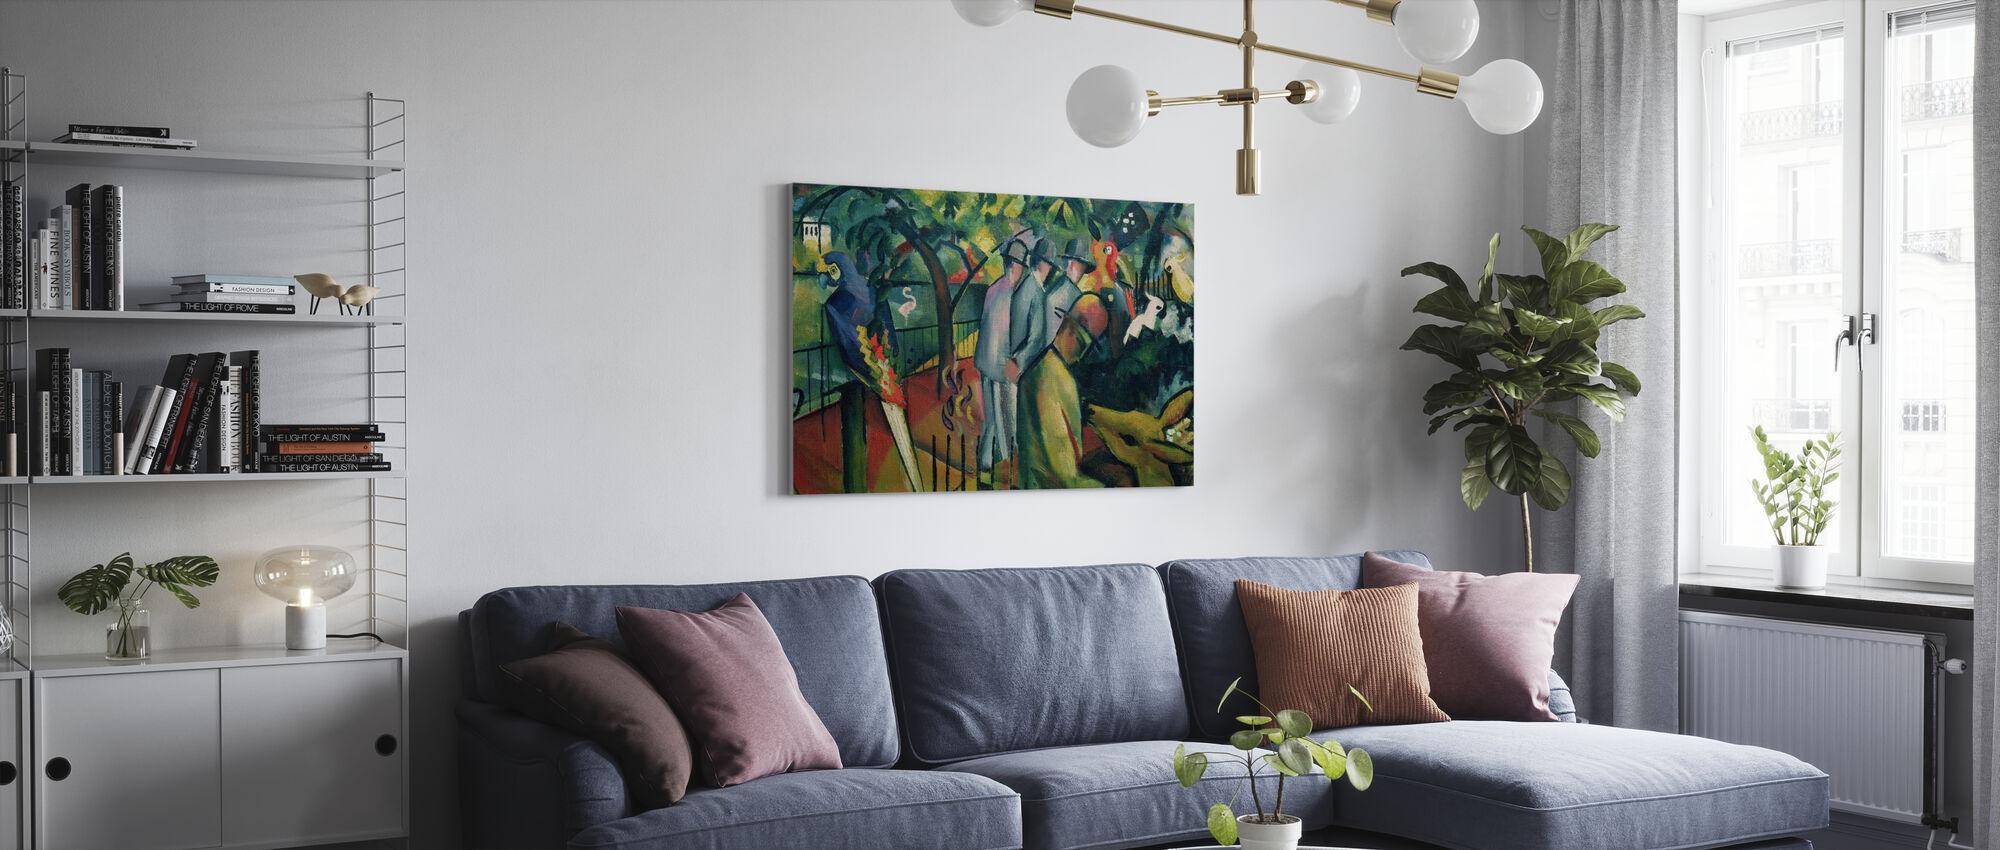 August Macke - Impression sur toile - Salle à manger